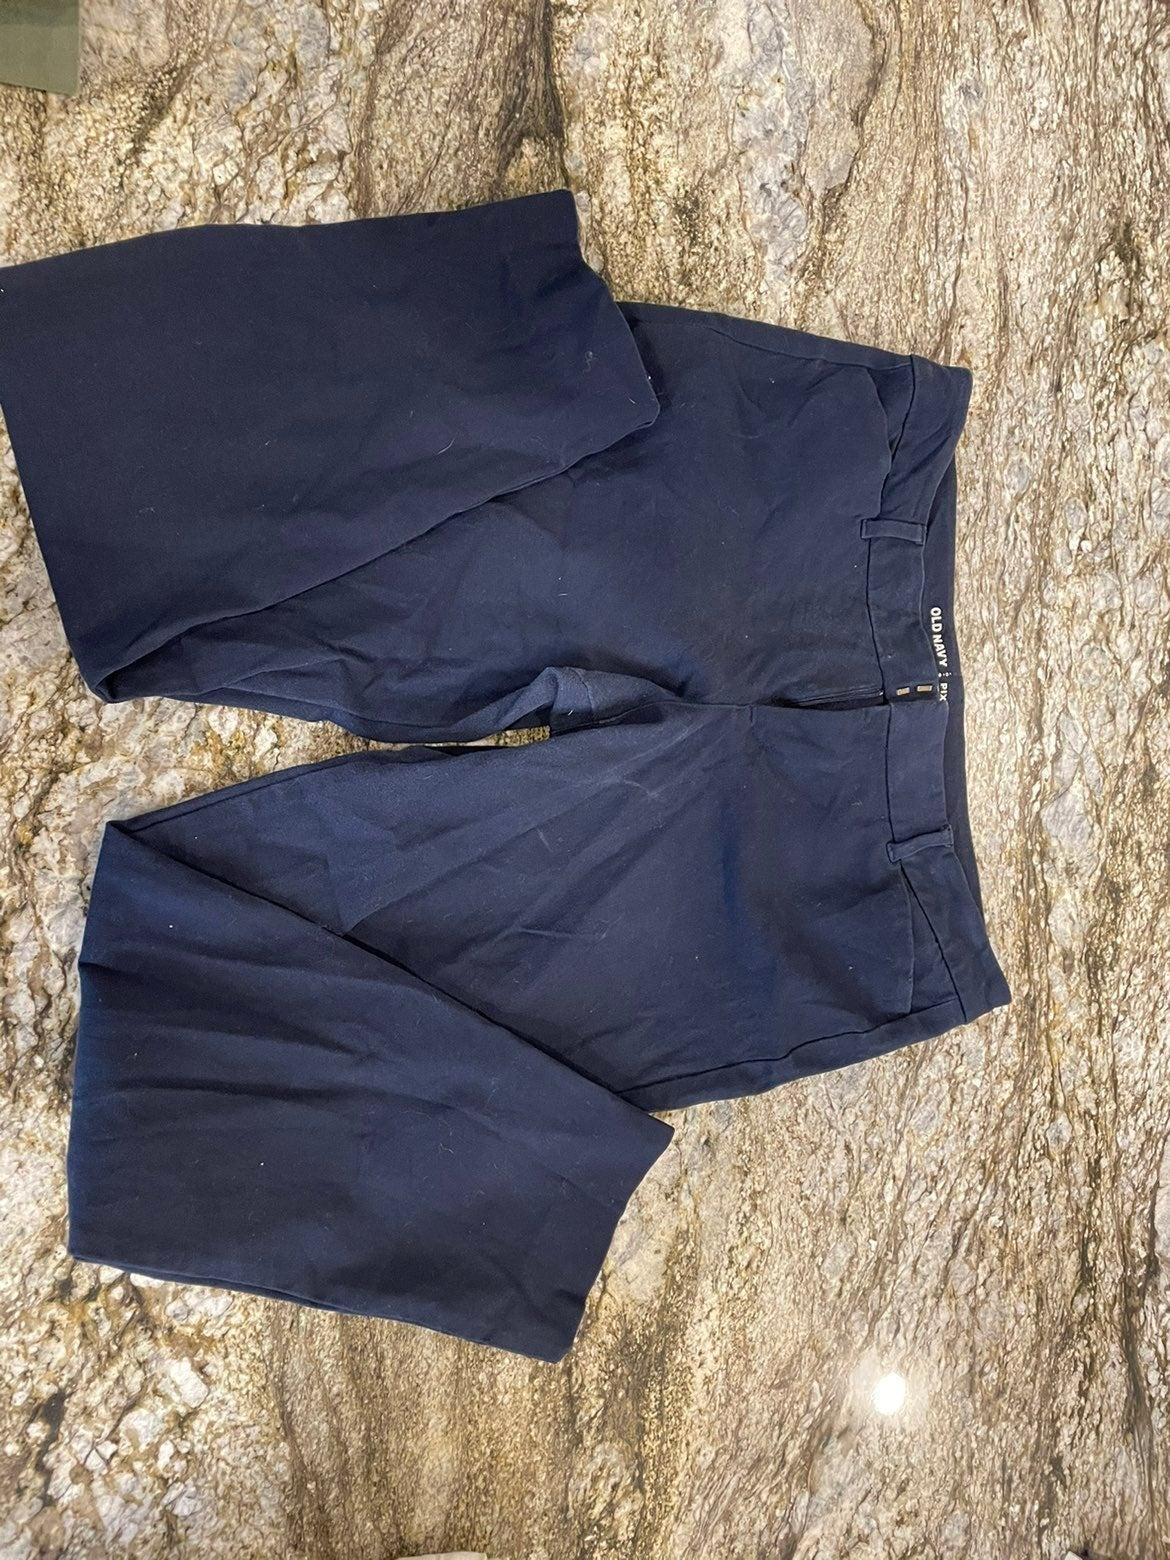 Old Navy Pixie Pants in Navy